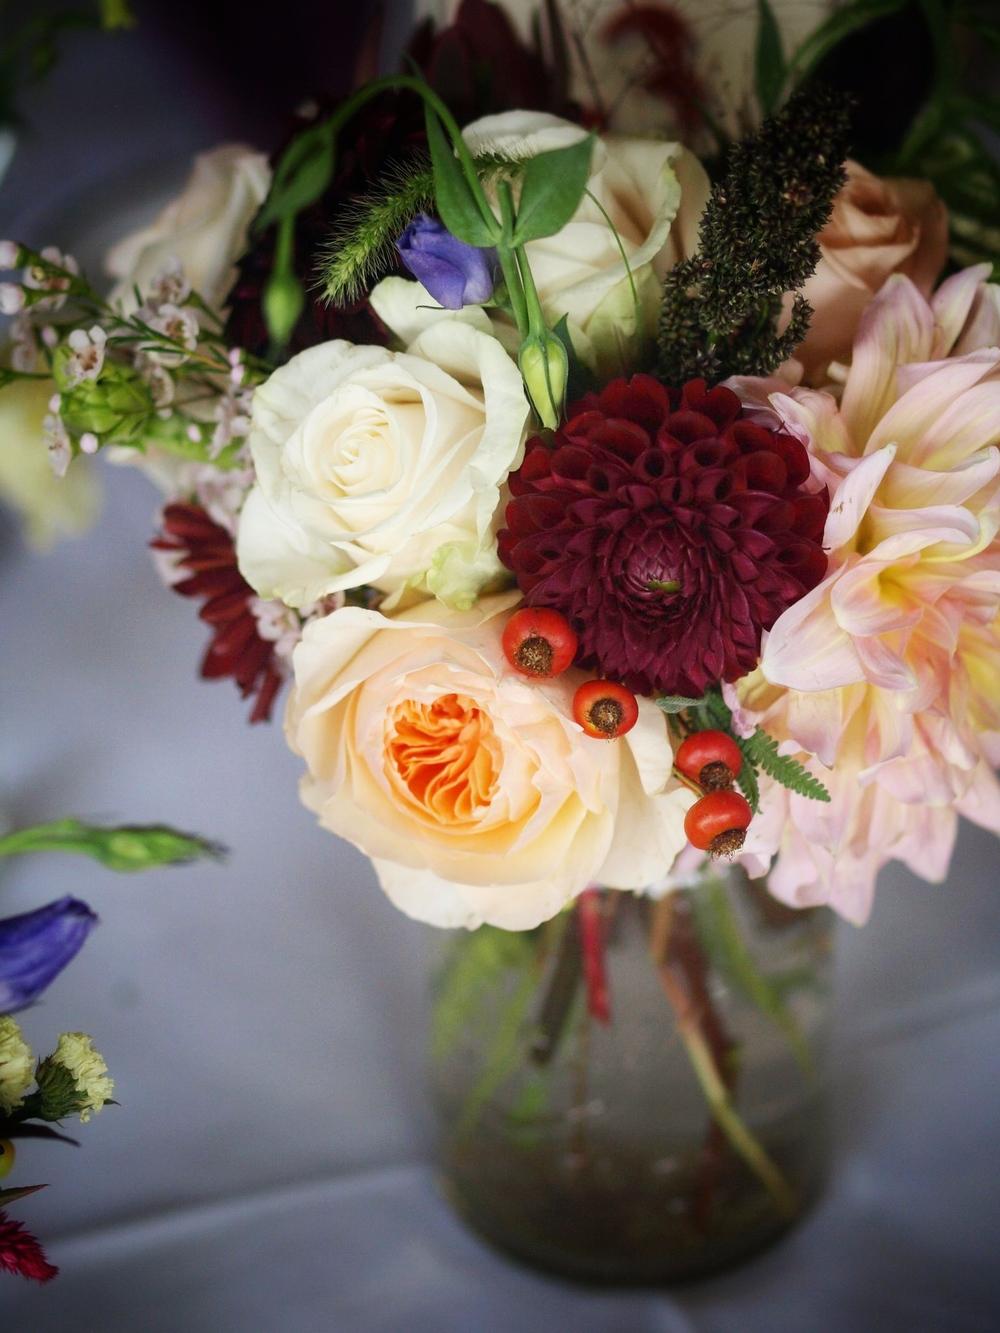 Oreonta house woodstock wedding mason jar centerpiece with garden rose dahlia and wildflowers.jpg